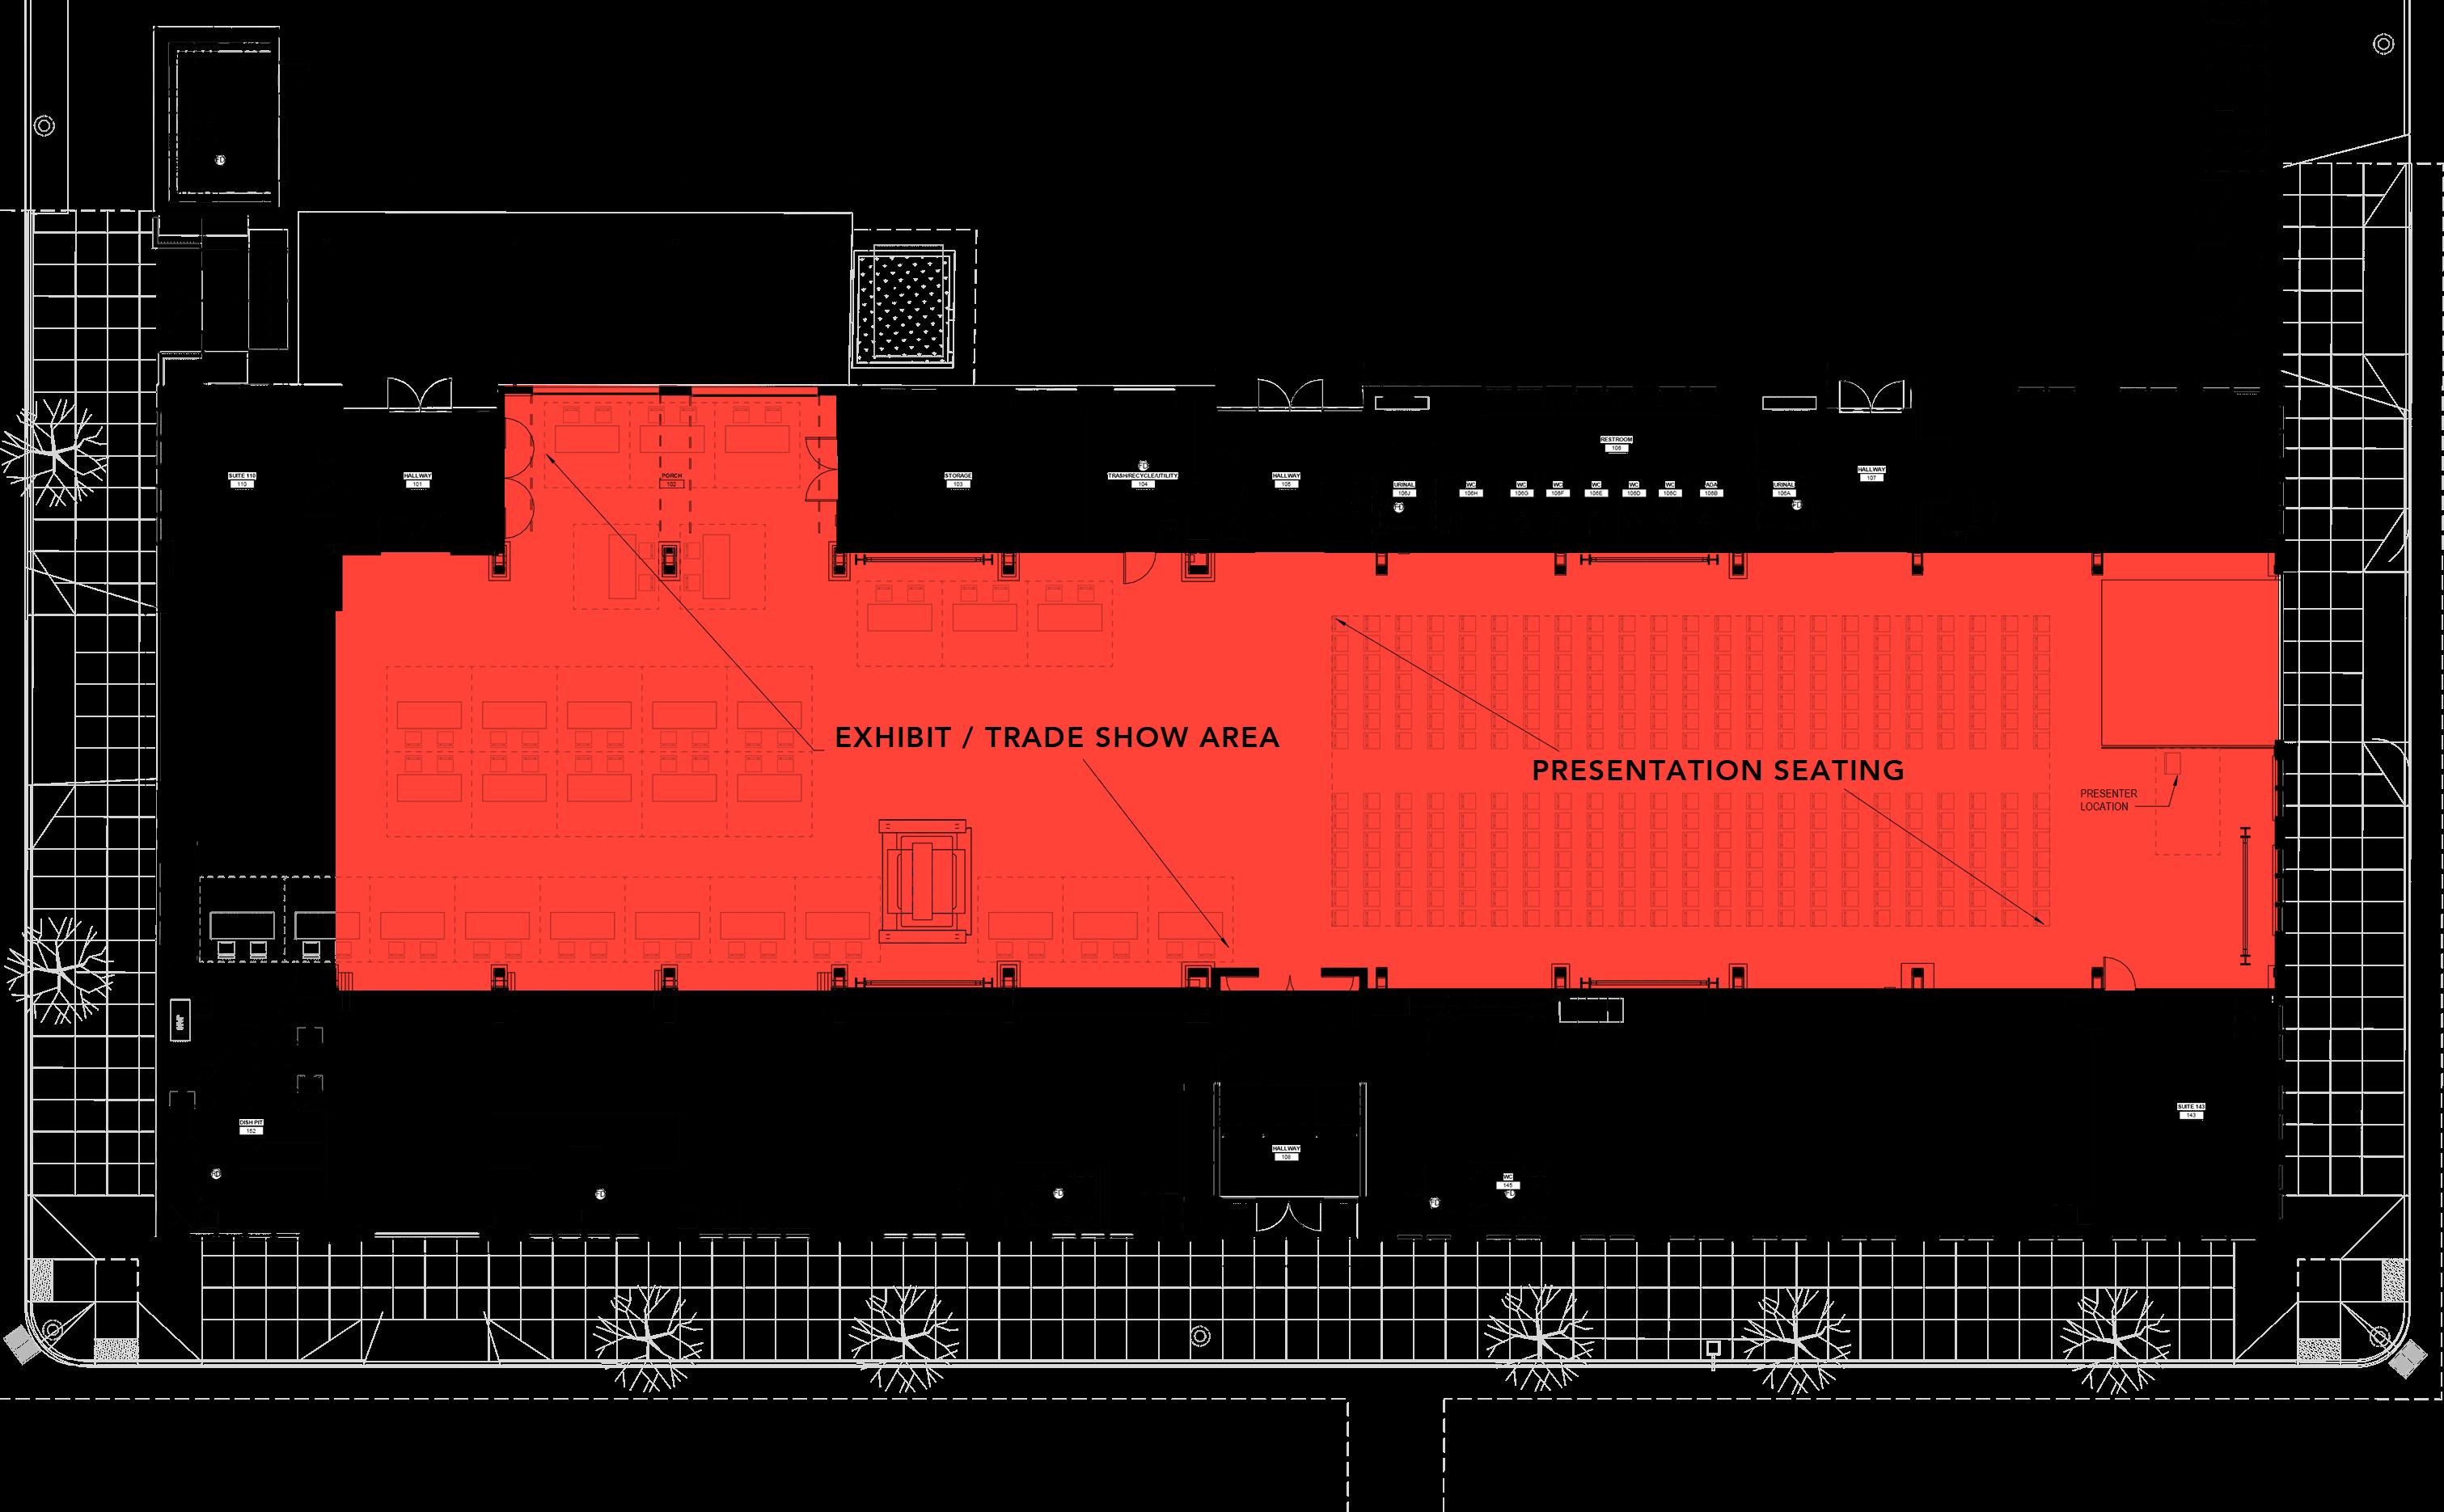 REDD-EAST_Exhibit-Plan_20171121